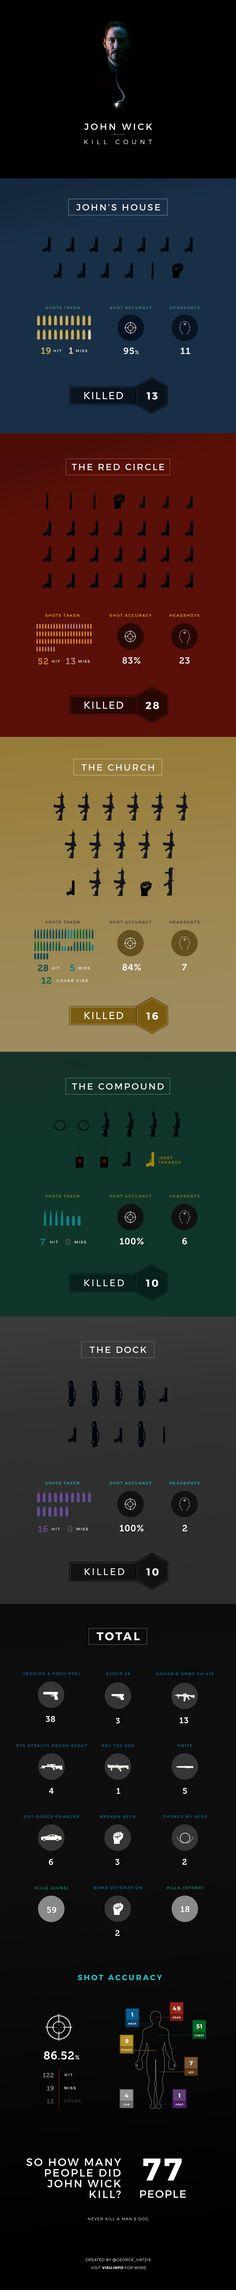 John Wick Infografik: Anzahl Schüsse, Treffer, Headshots und mehr. #JohnWick #Infografik #Infographic #KillCount